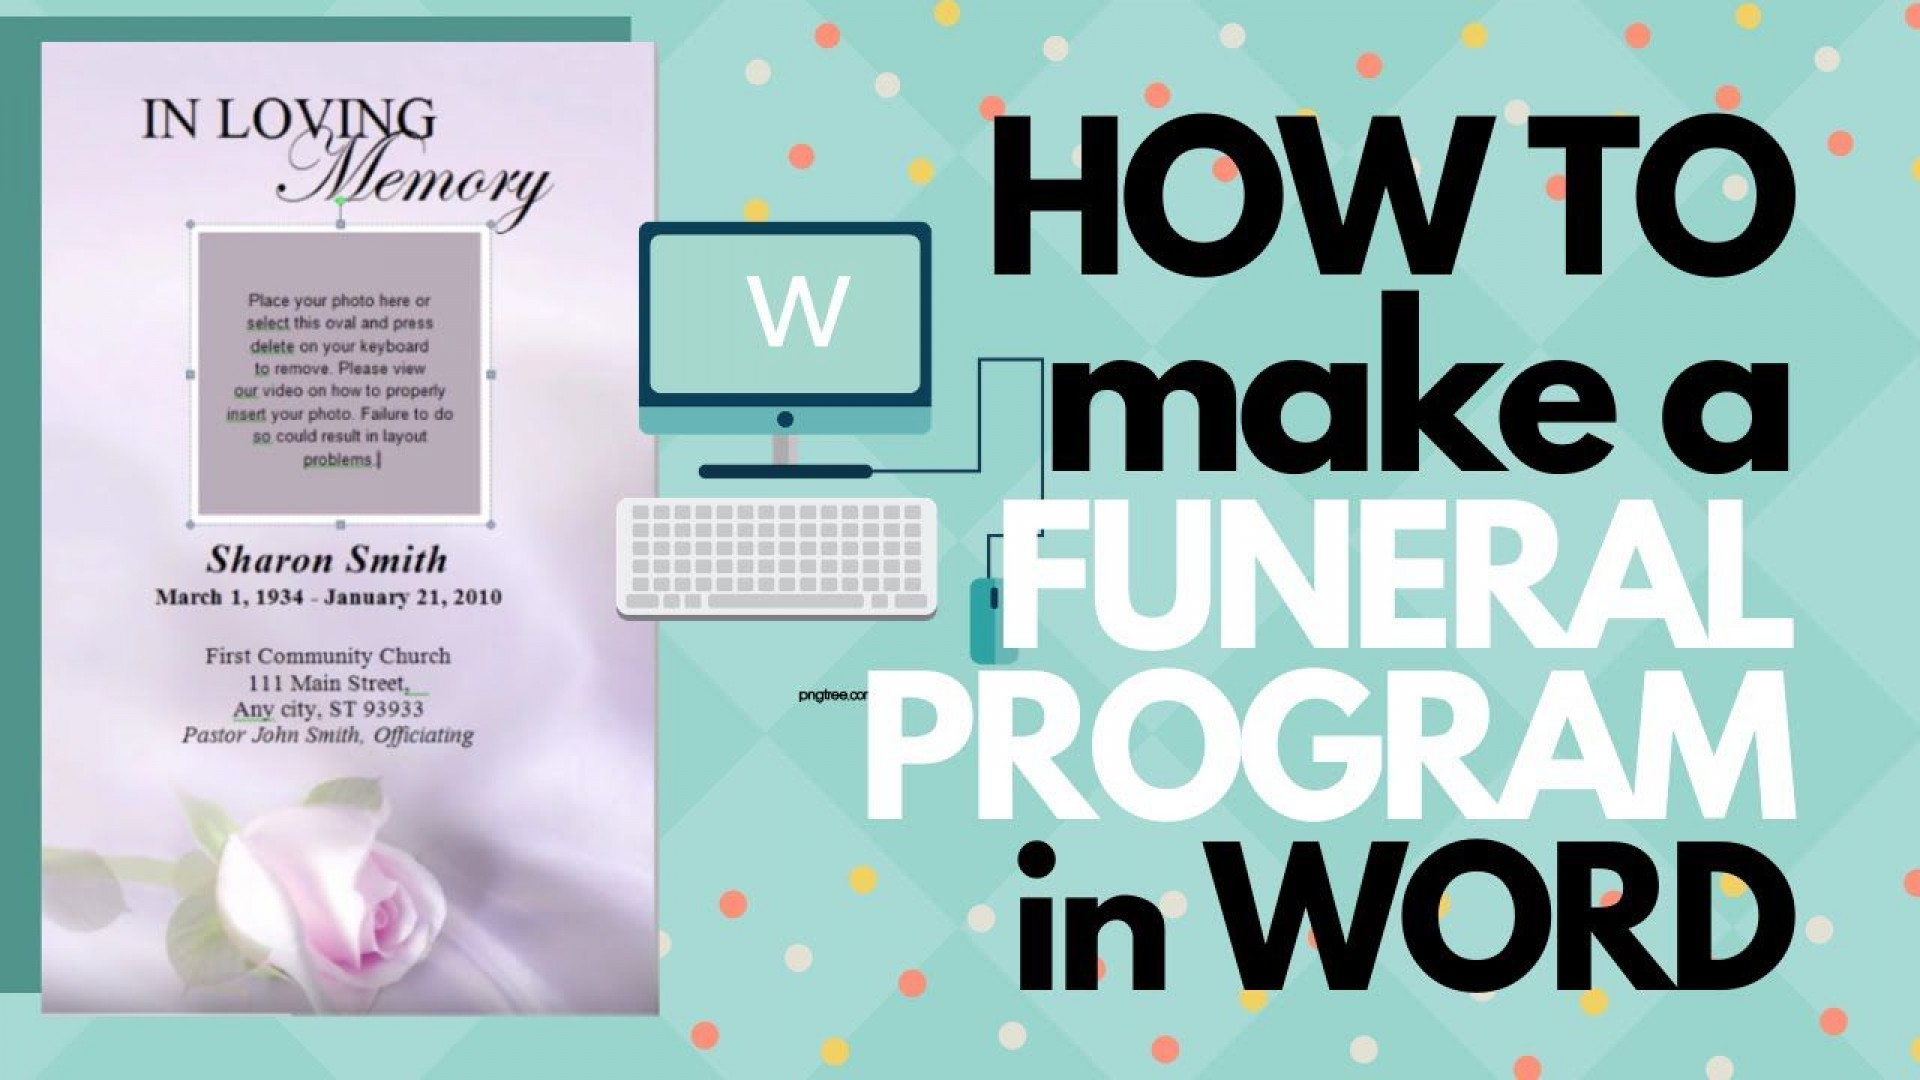 009 Unusual Free Funeral Program Template Example  Word Catholic Editable Pdf1920